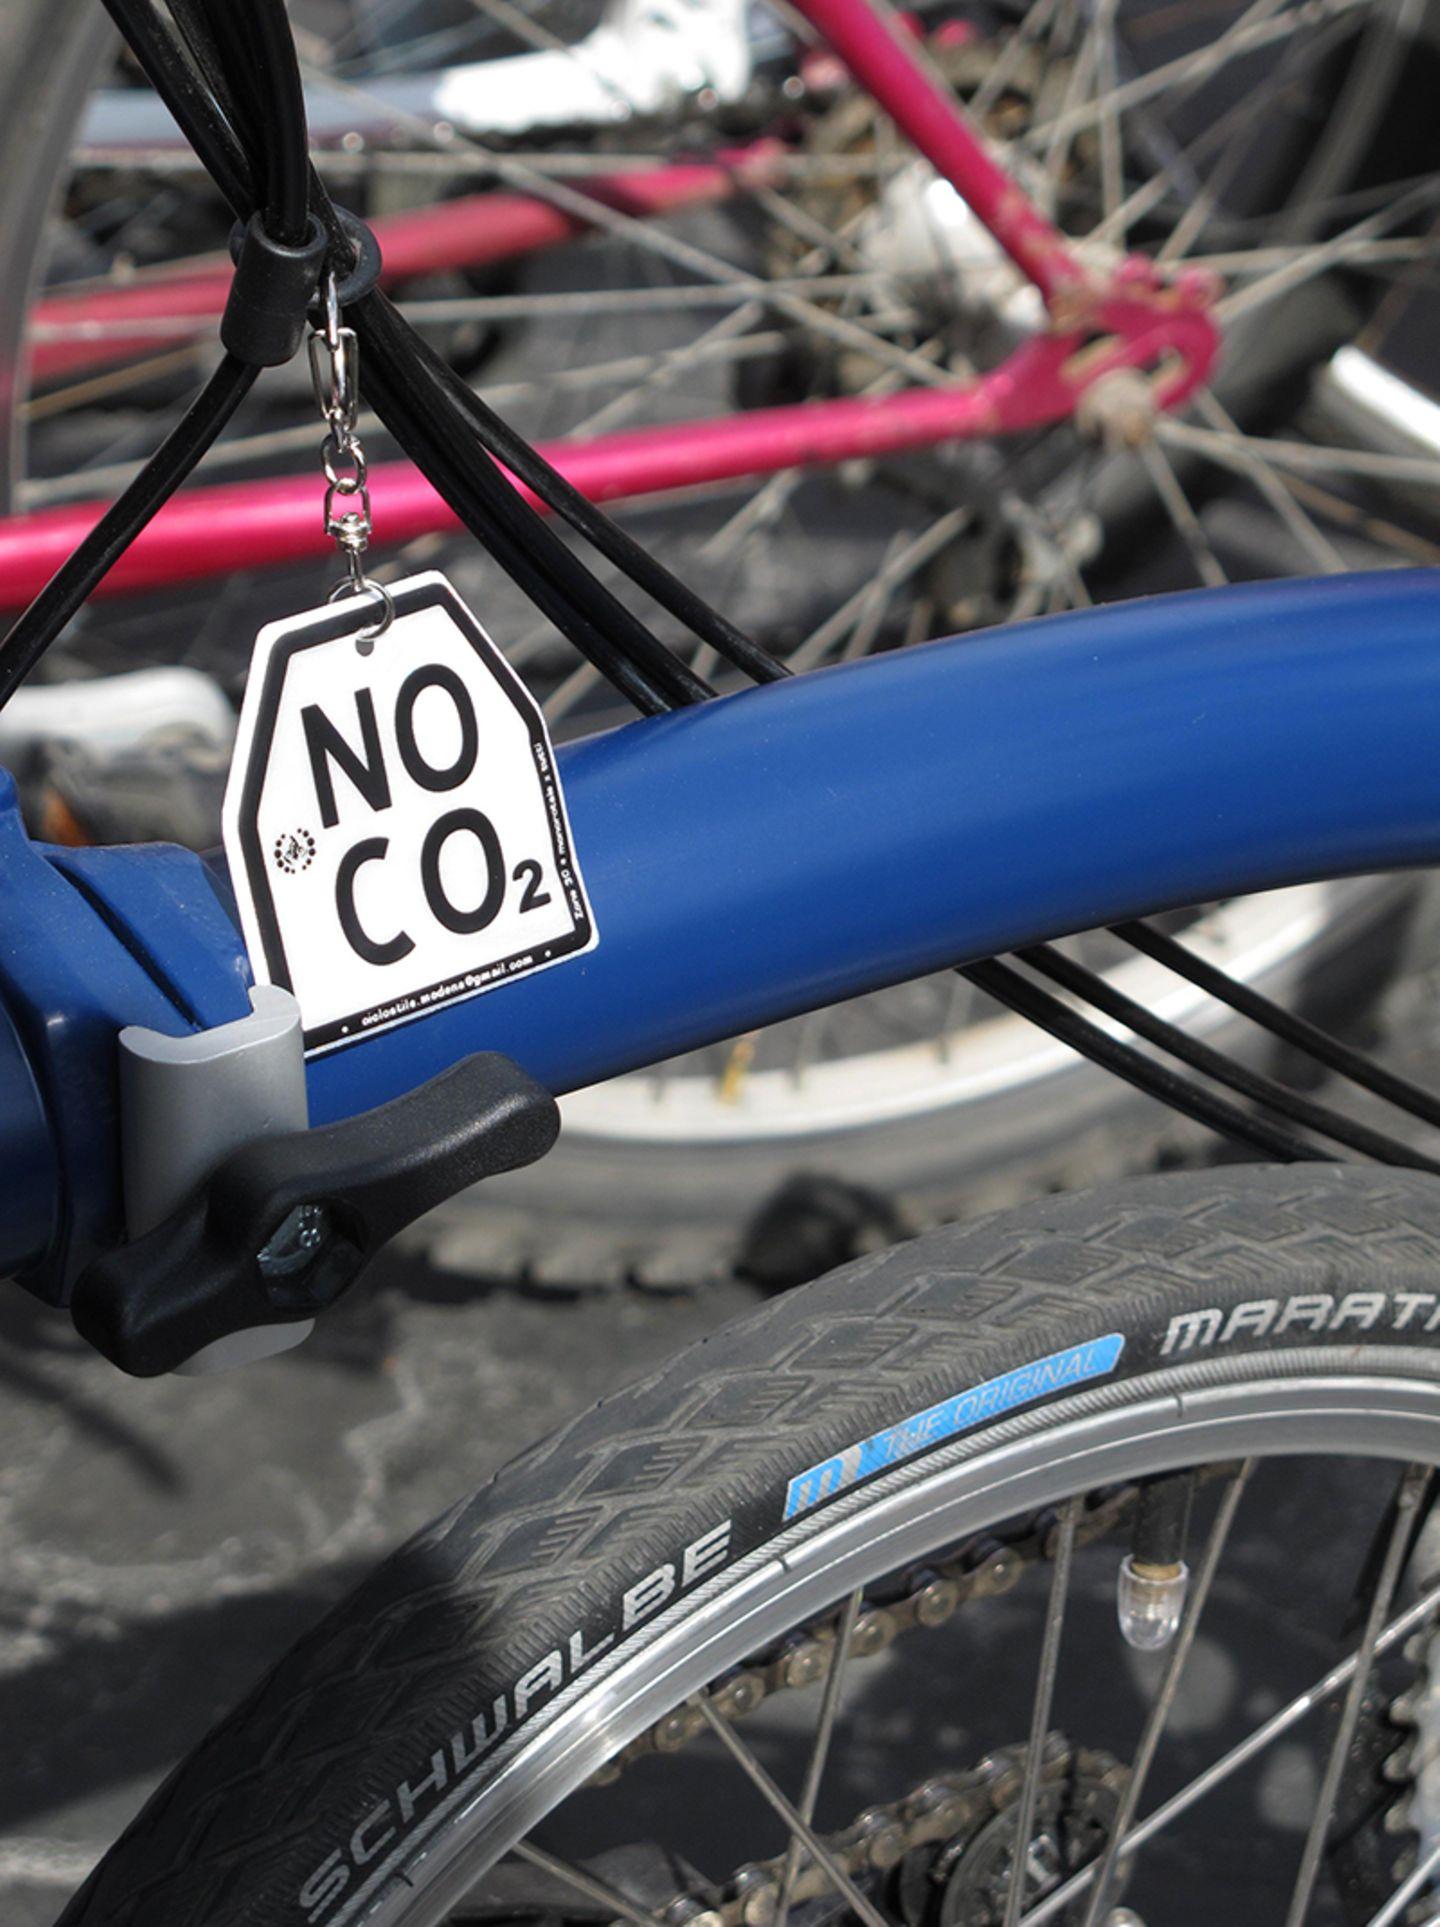 Fahrrad, Klimaneutral